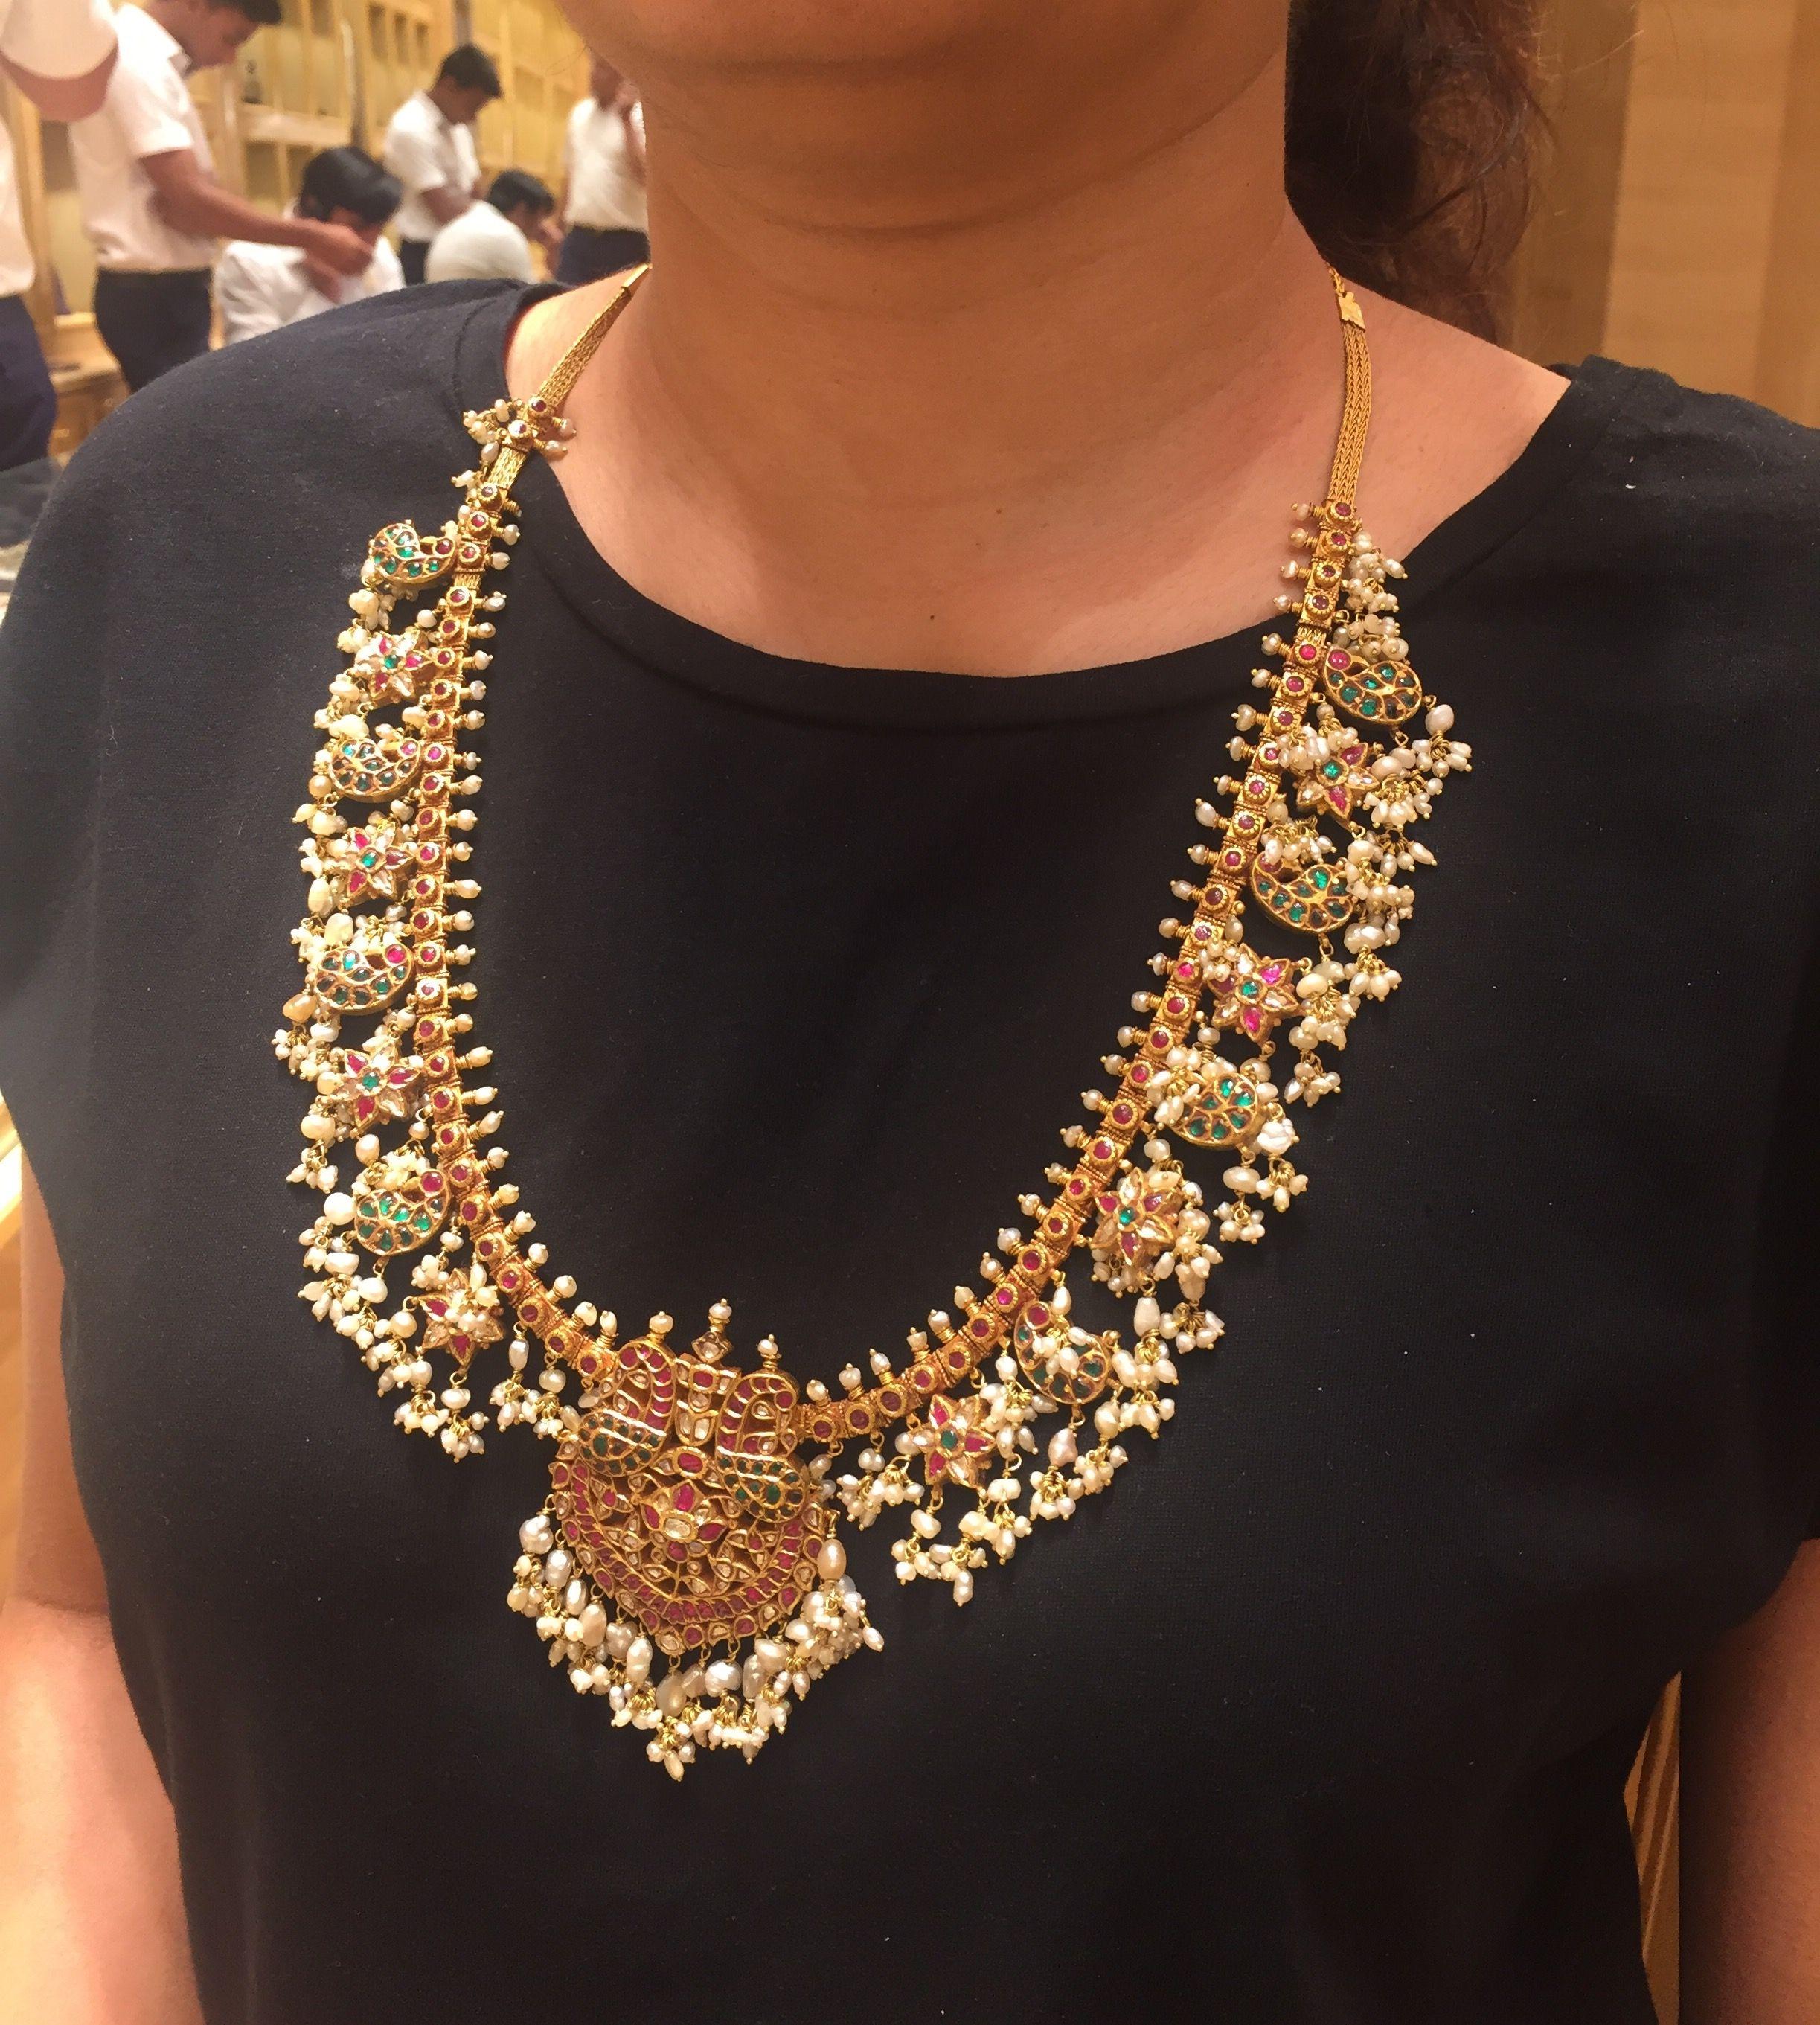 Pin by Vimala Reddy on Jewellery Pinterest Jewel Indian jewelry